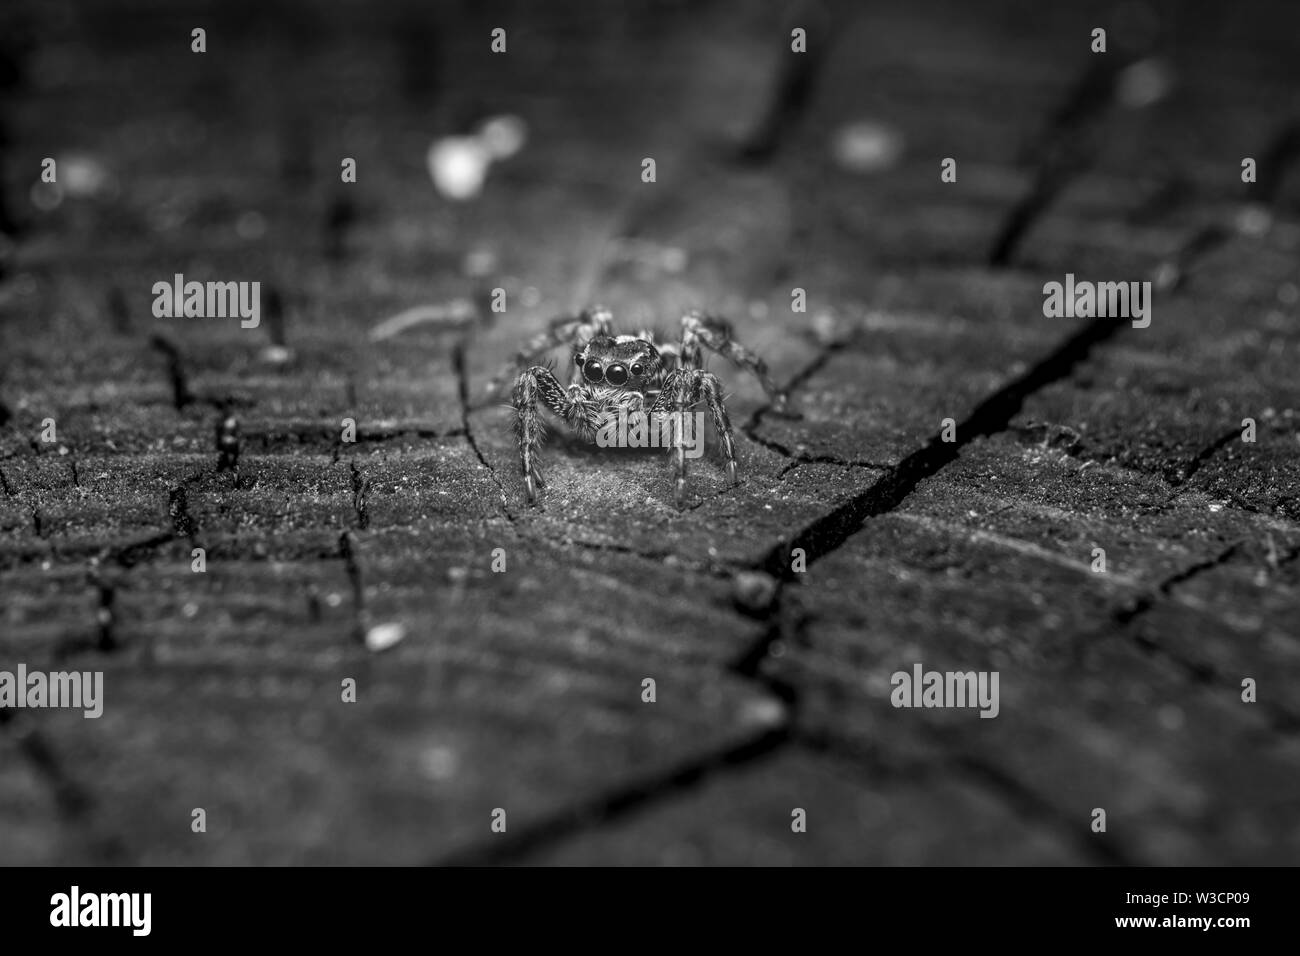 beautiful macro photo of a small jumping spider Stock Photo